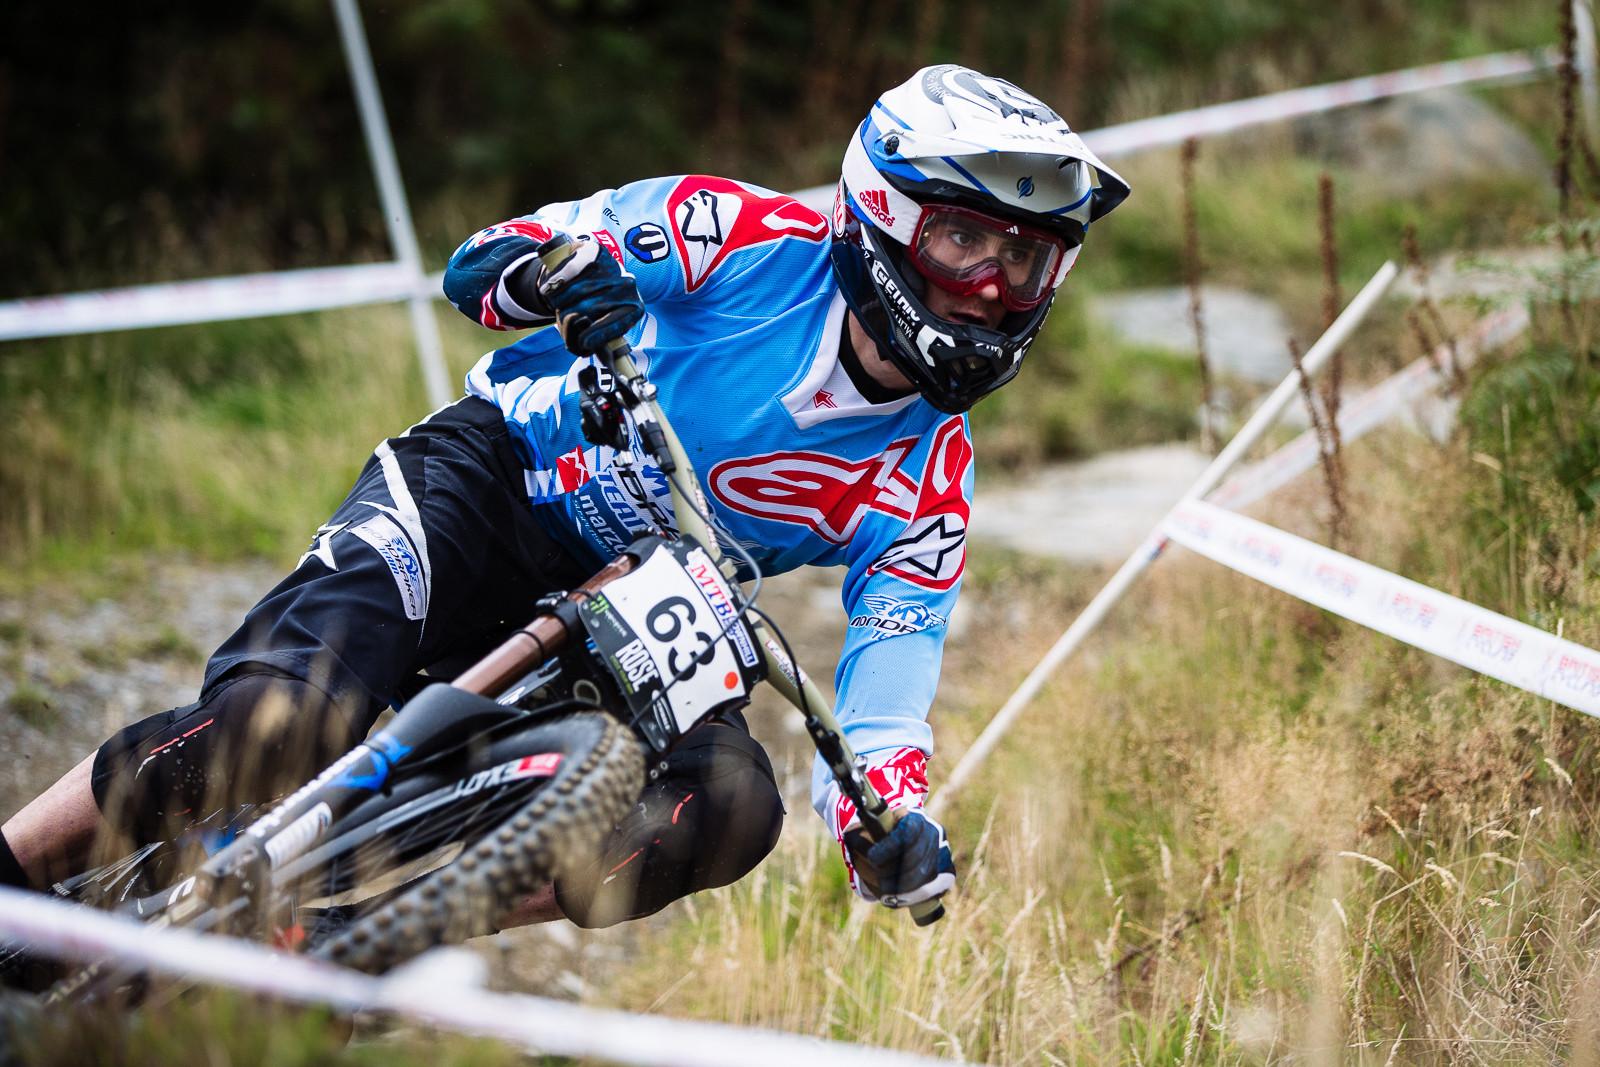 Innes Graham, 2015 British Downhill Series Finals, Antur Stiniog - 2015 British Downhill Series Finals - Mountain Biking Pictures - Vital MTB